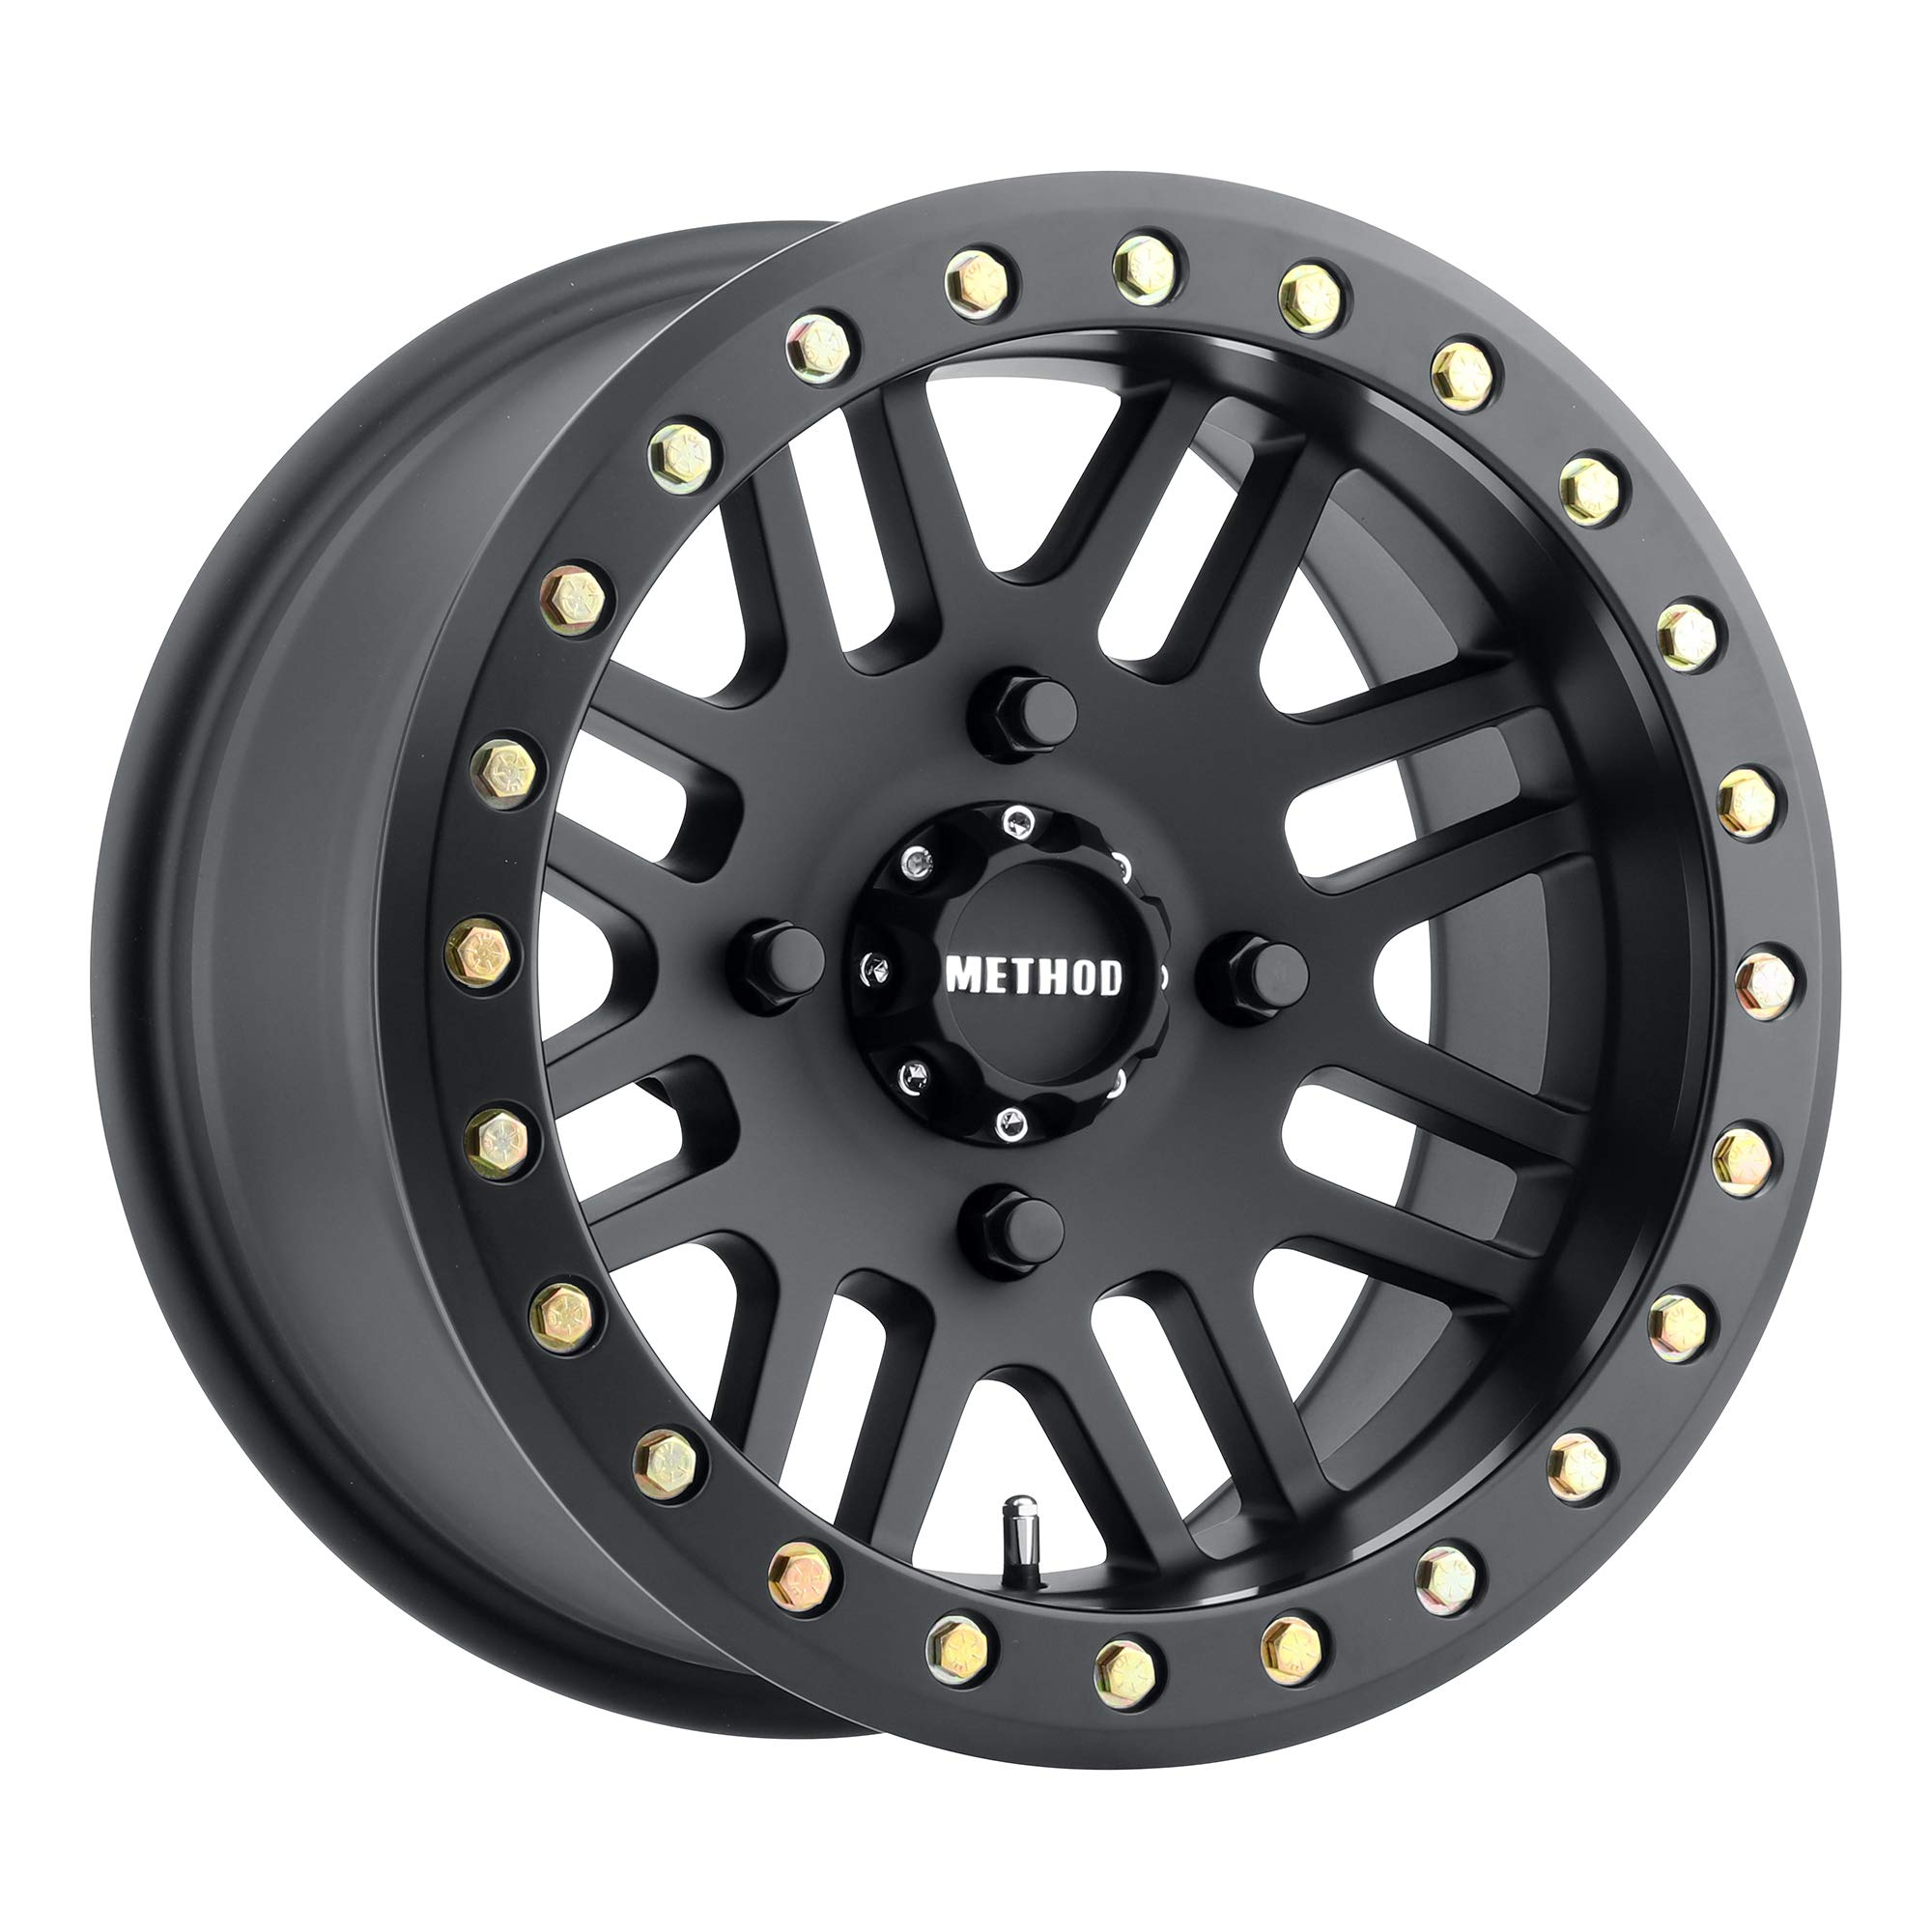 "Method Race Wheels 406 UTV Beadlock Matte Black 14x8"" 4x156"", 2mm offset 4.3"" Backspace, MR40648046544B"